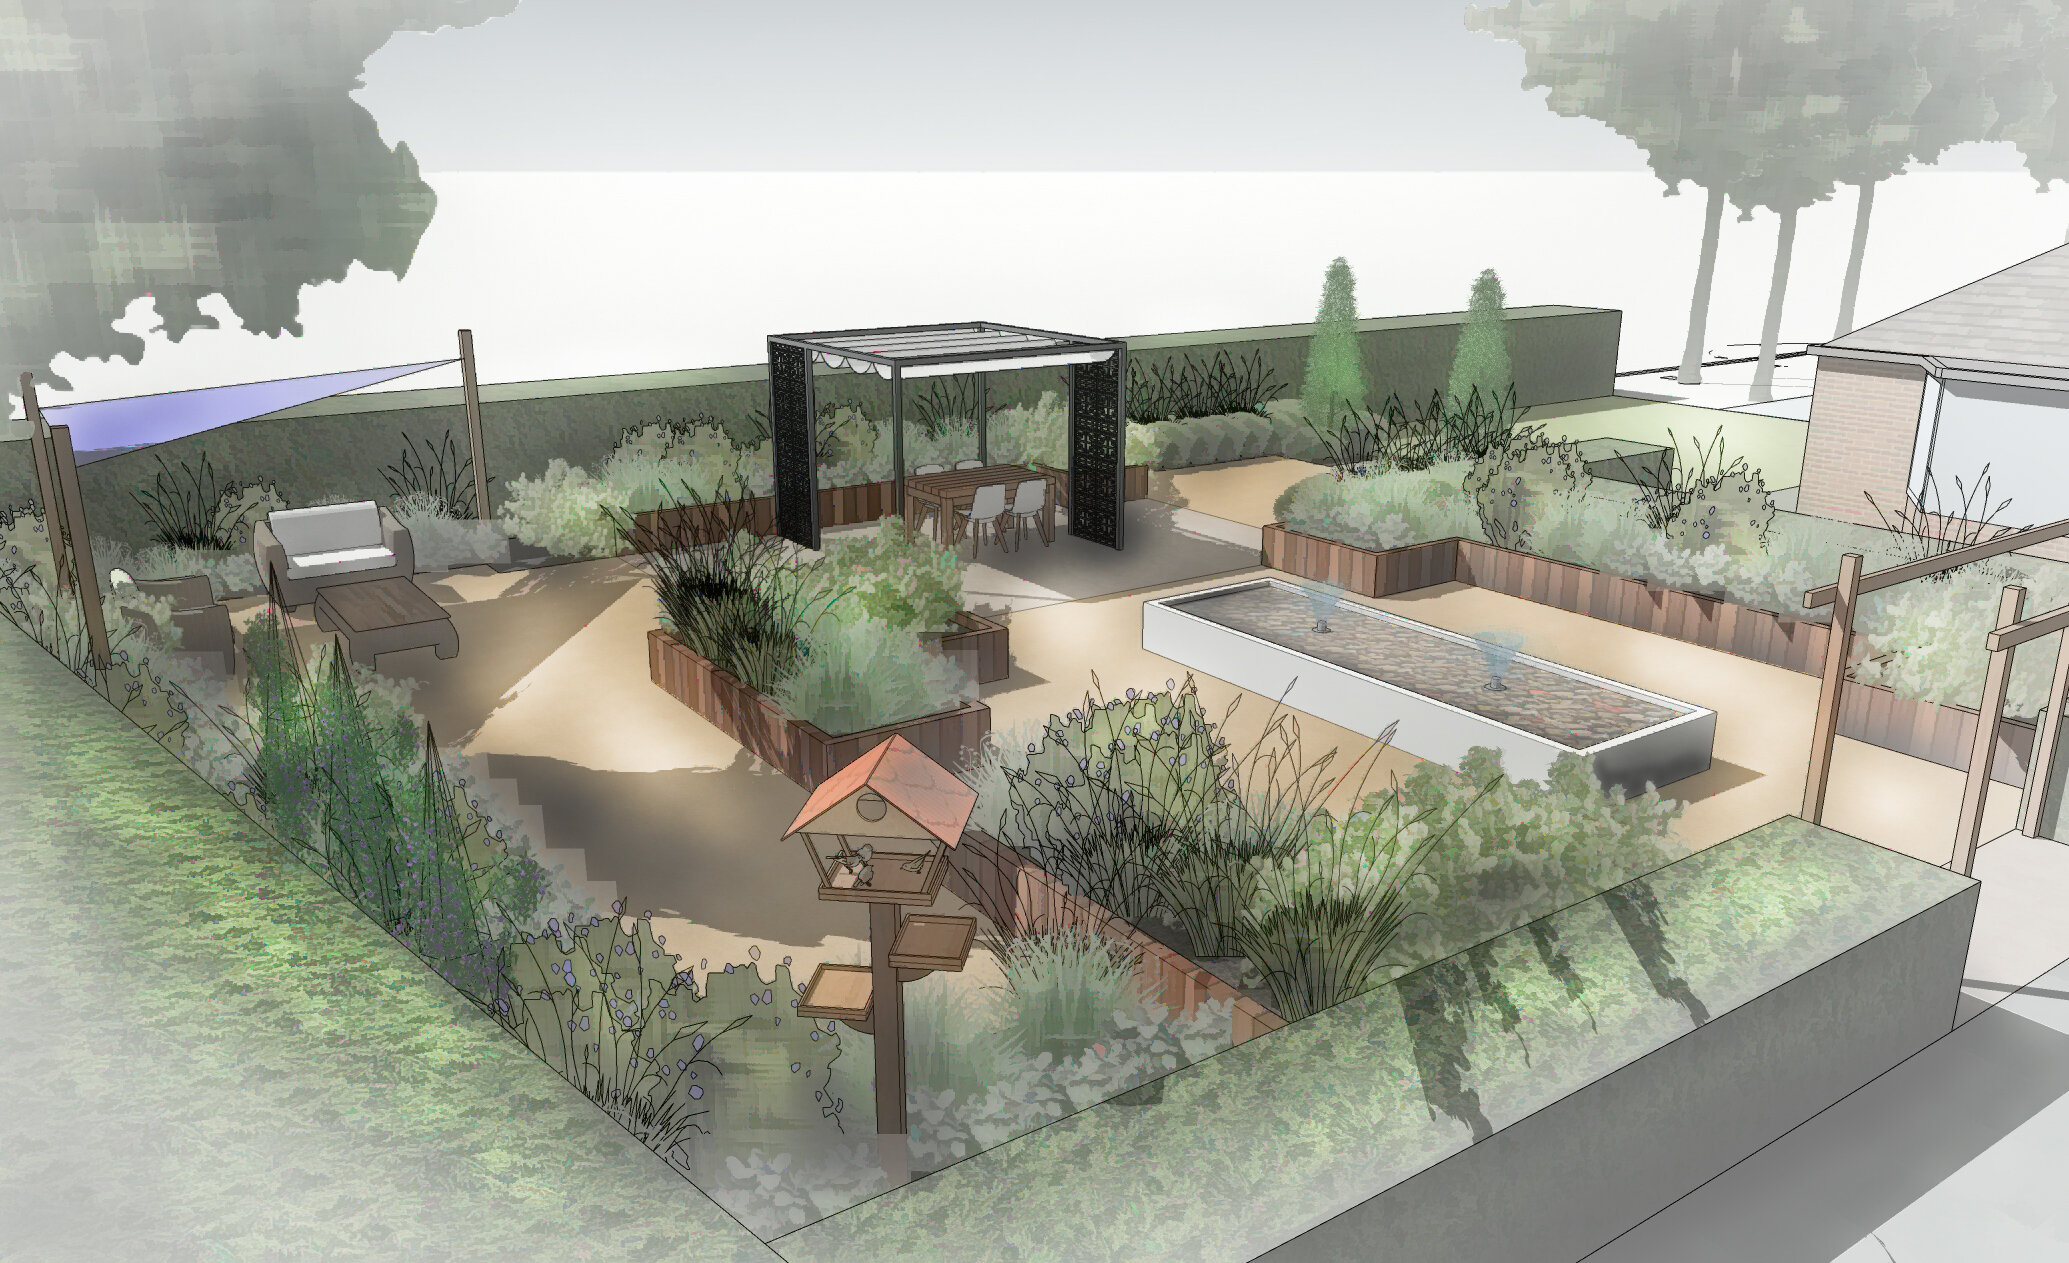 Concept plan image 1c.jpg